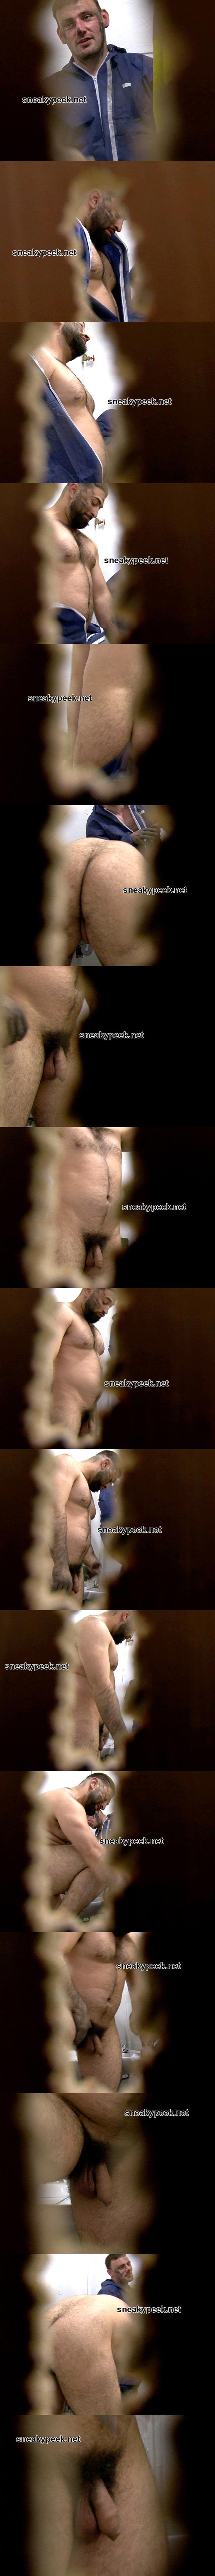 man with big hairy dick caught naked lockerroom